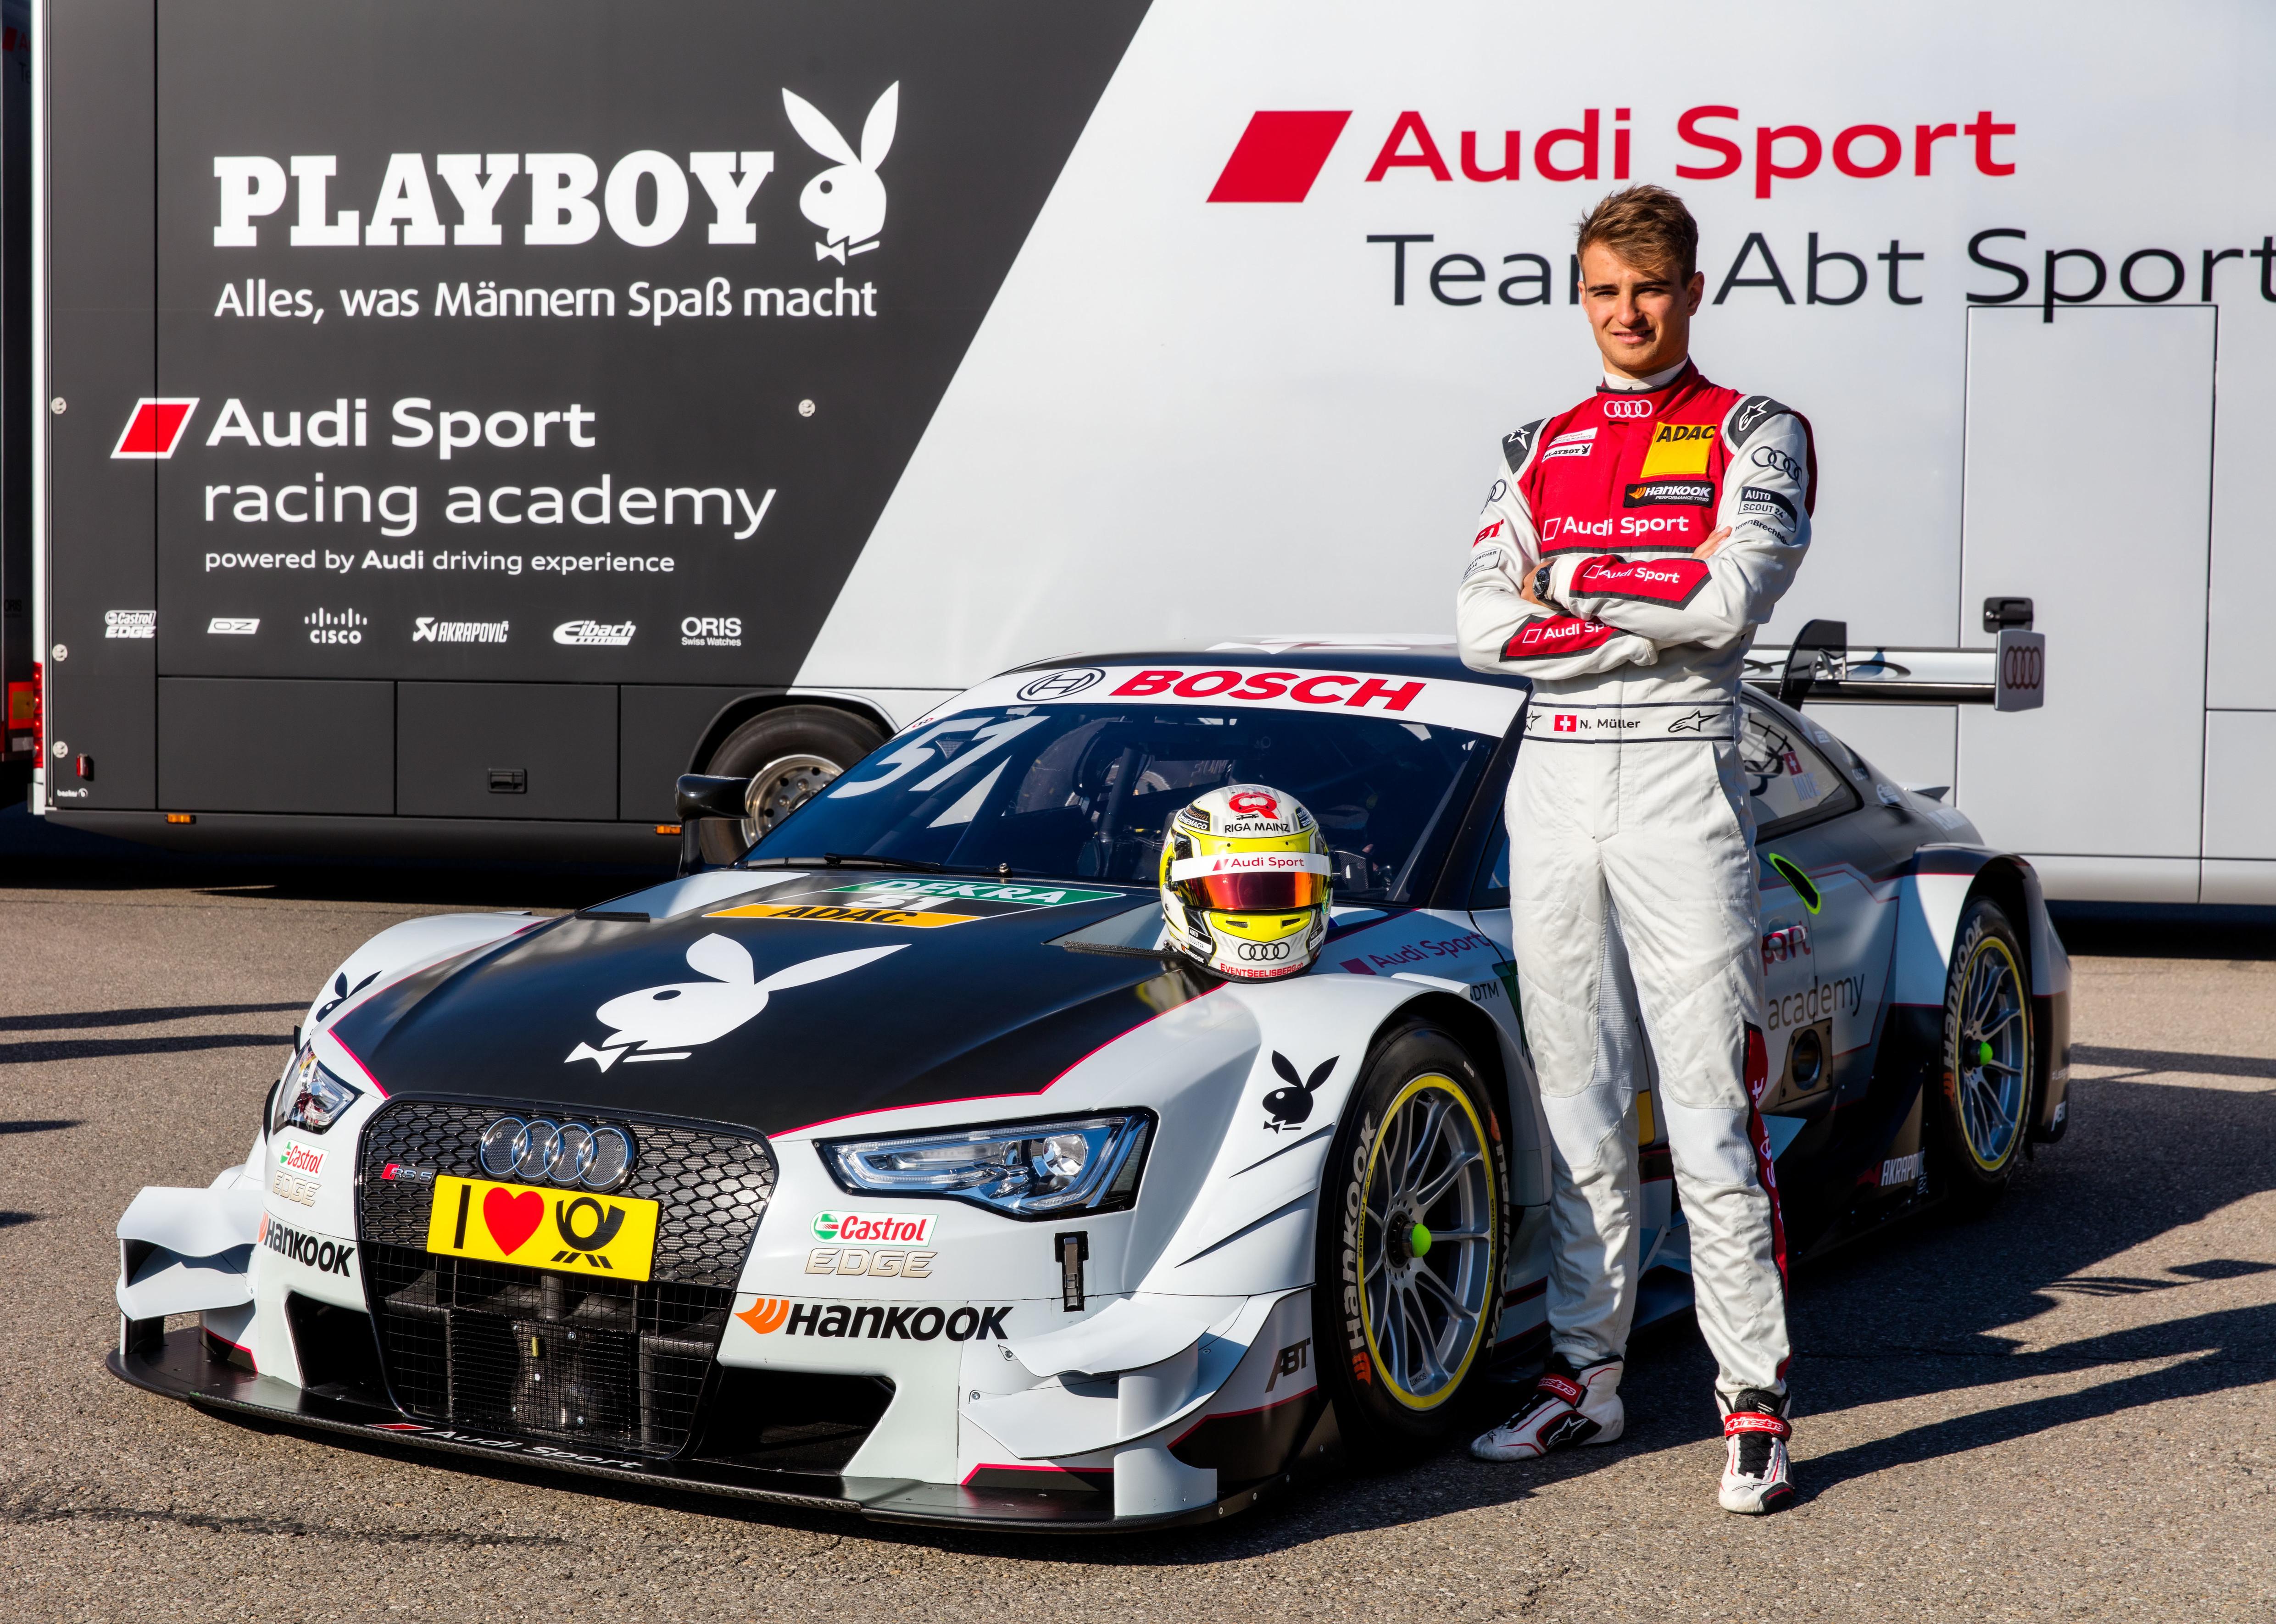 #51 Nico Müller Playboy Audi RS5 DTM